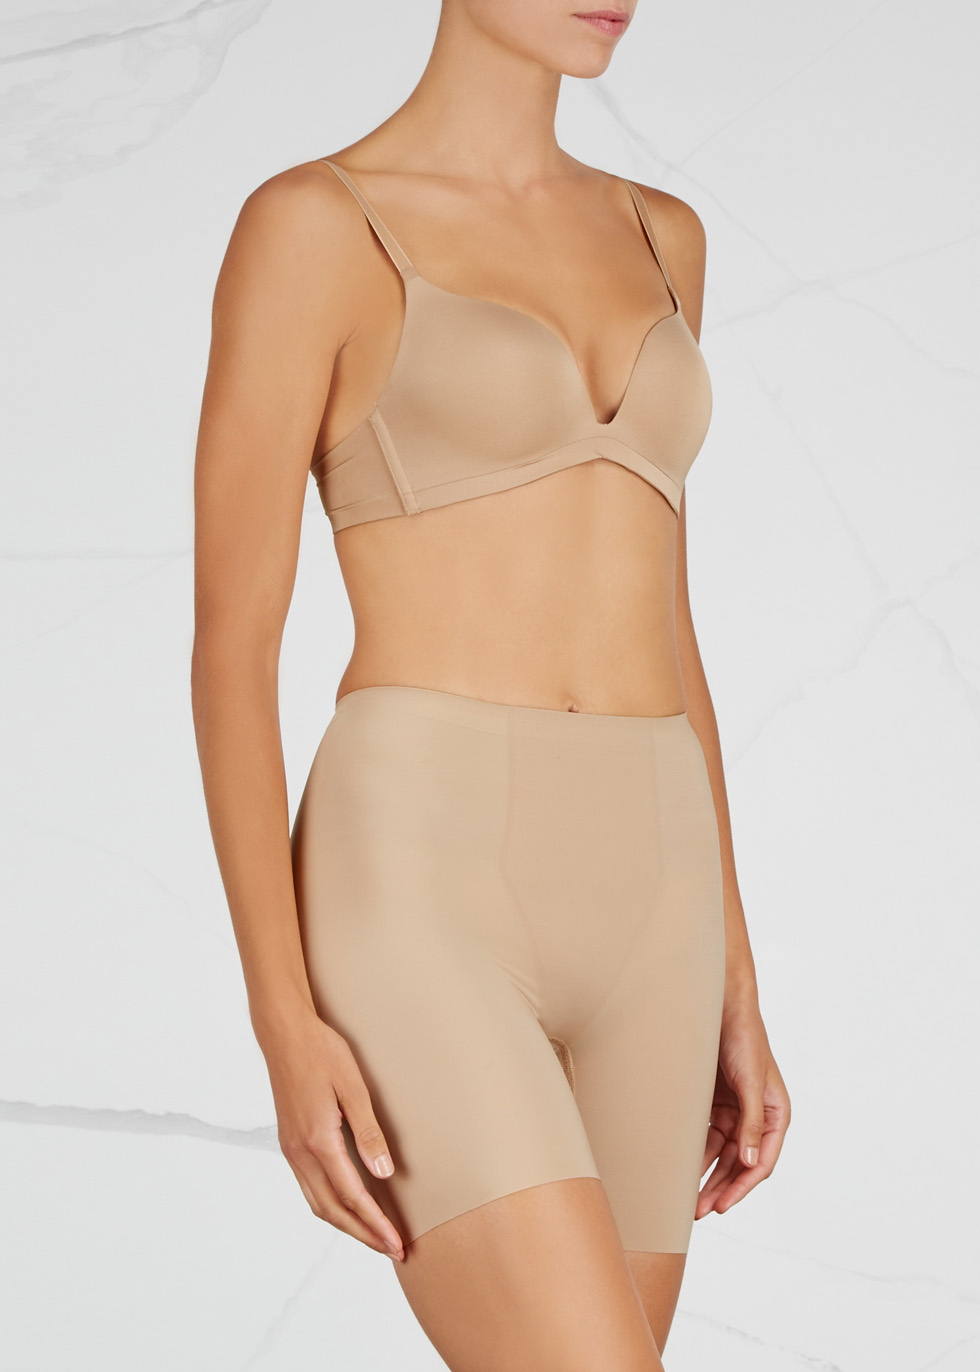 Intuition blush push-up bra - Wacoal